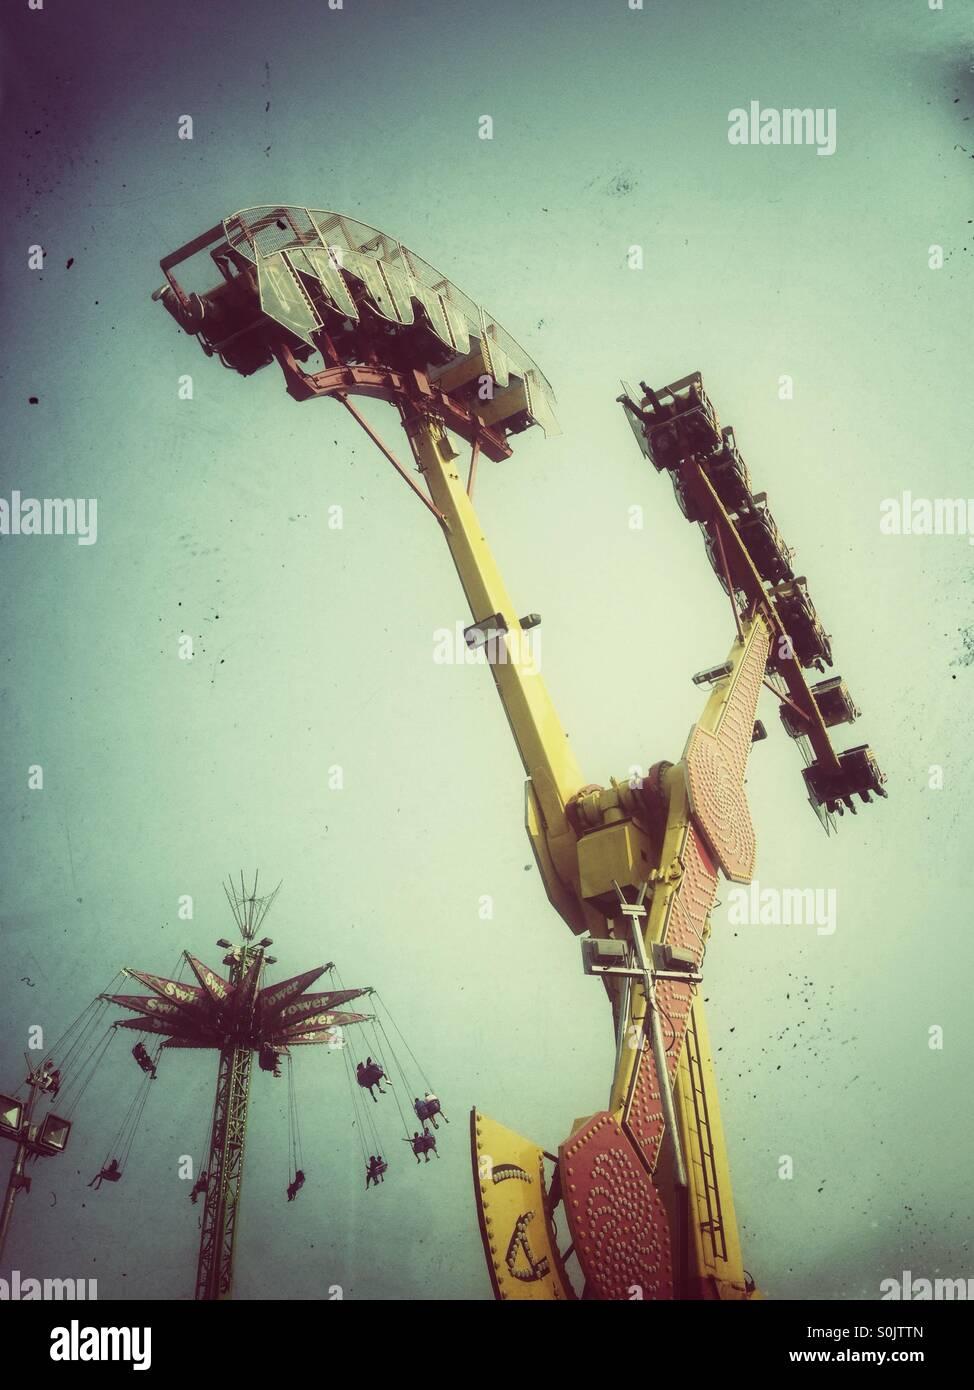 Pharaoh fury. The swinging boat ride. - Stock Image